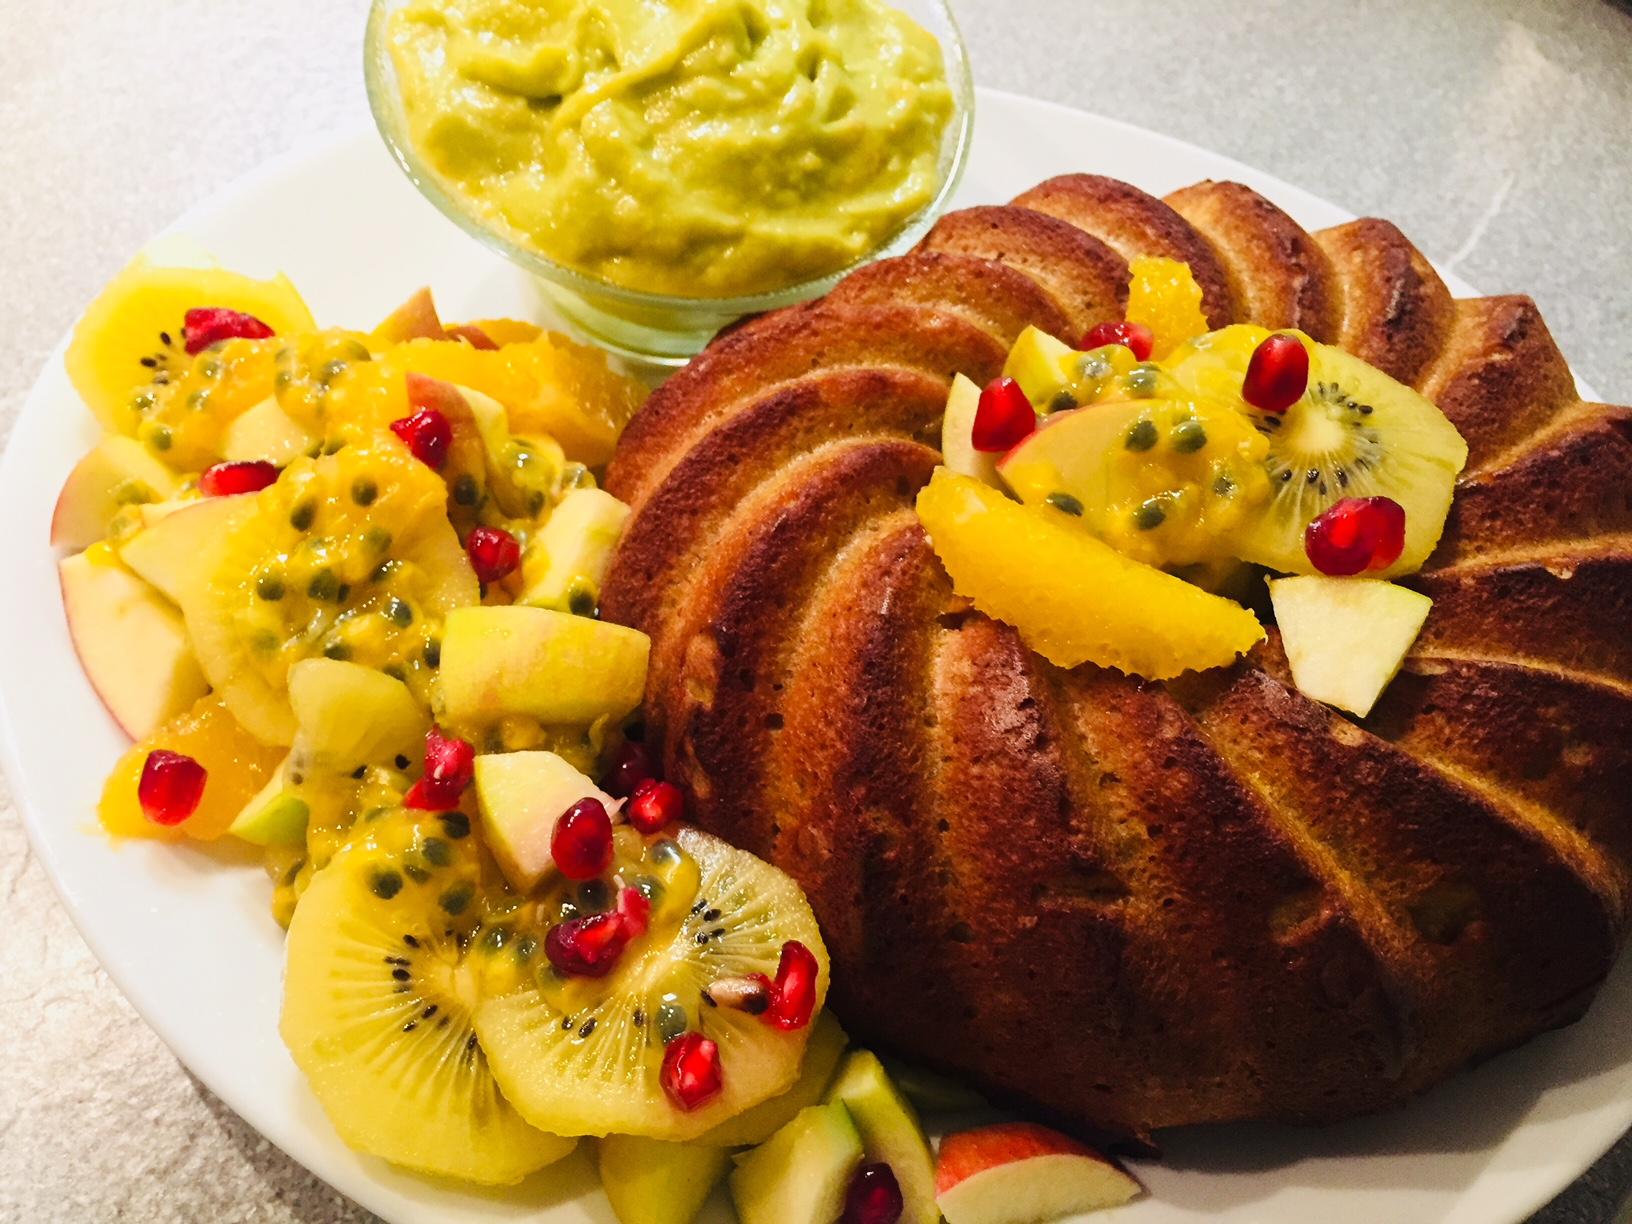 Kürbis-Gugelhupf mit Früchten